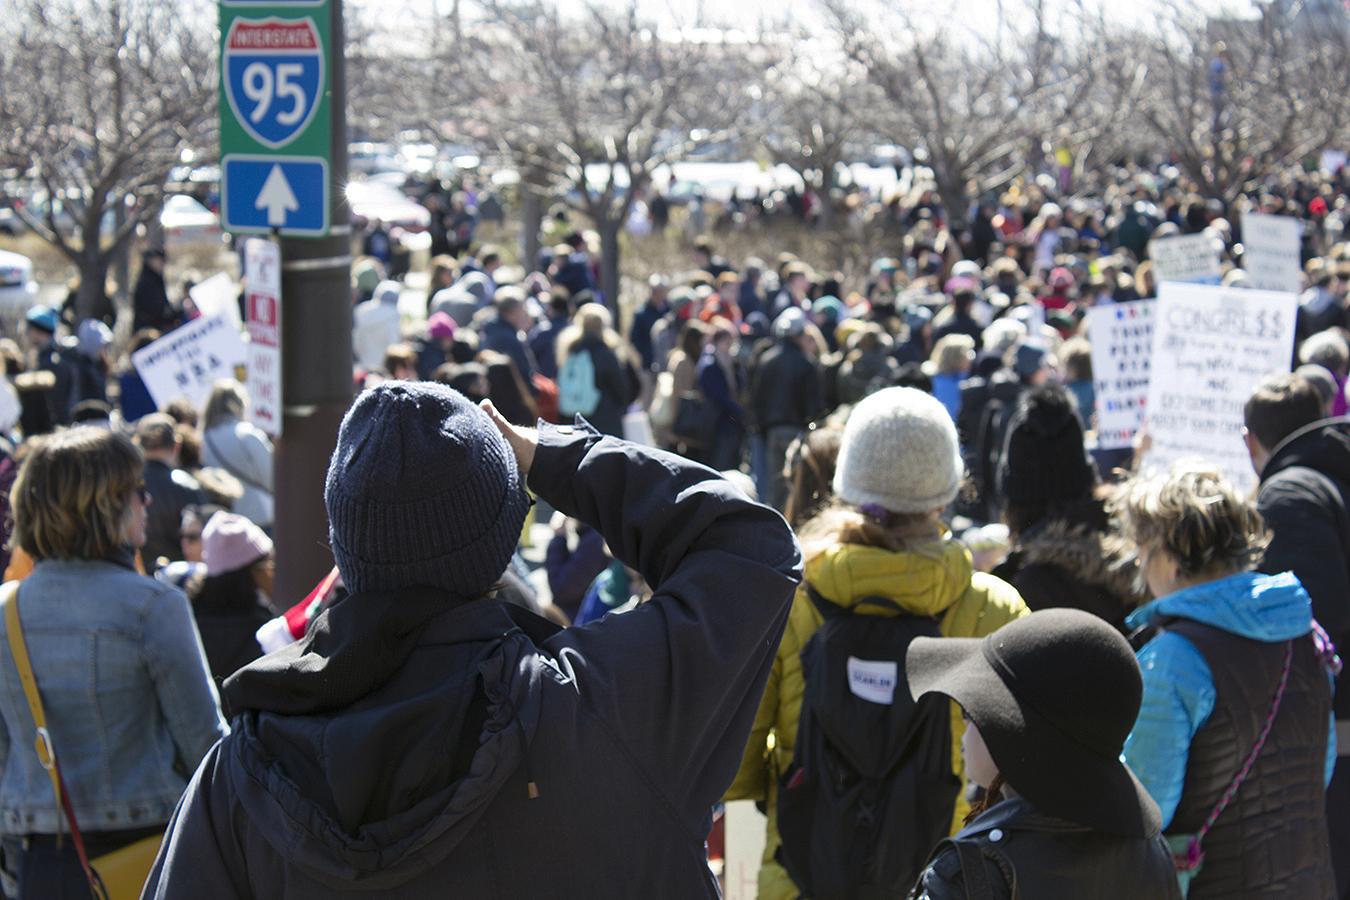 Hilary_Lam_Hugs_not_guns_protestor_philadelphia_Rally_Crowd